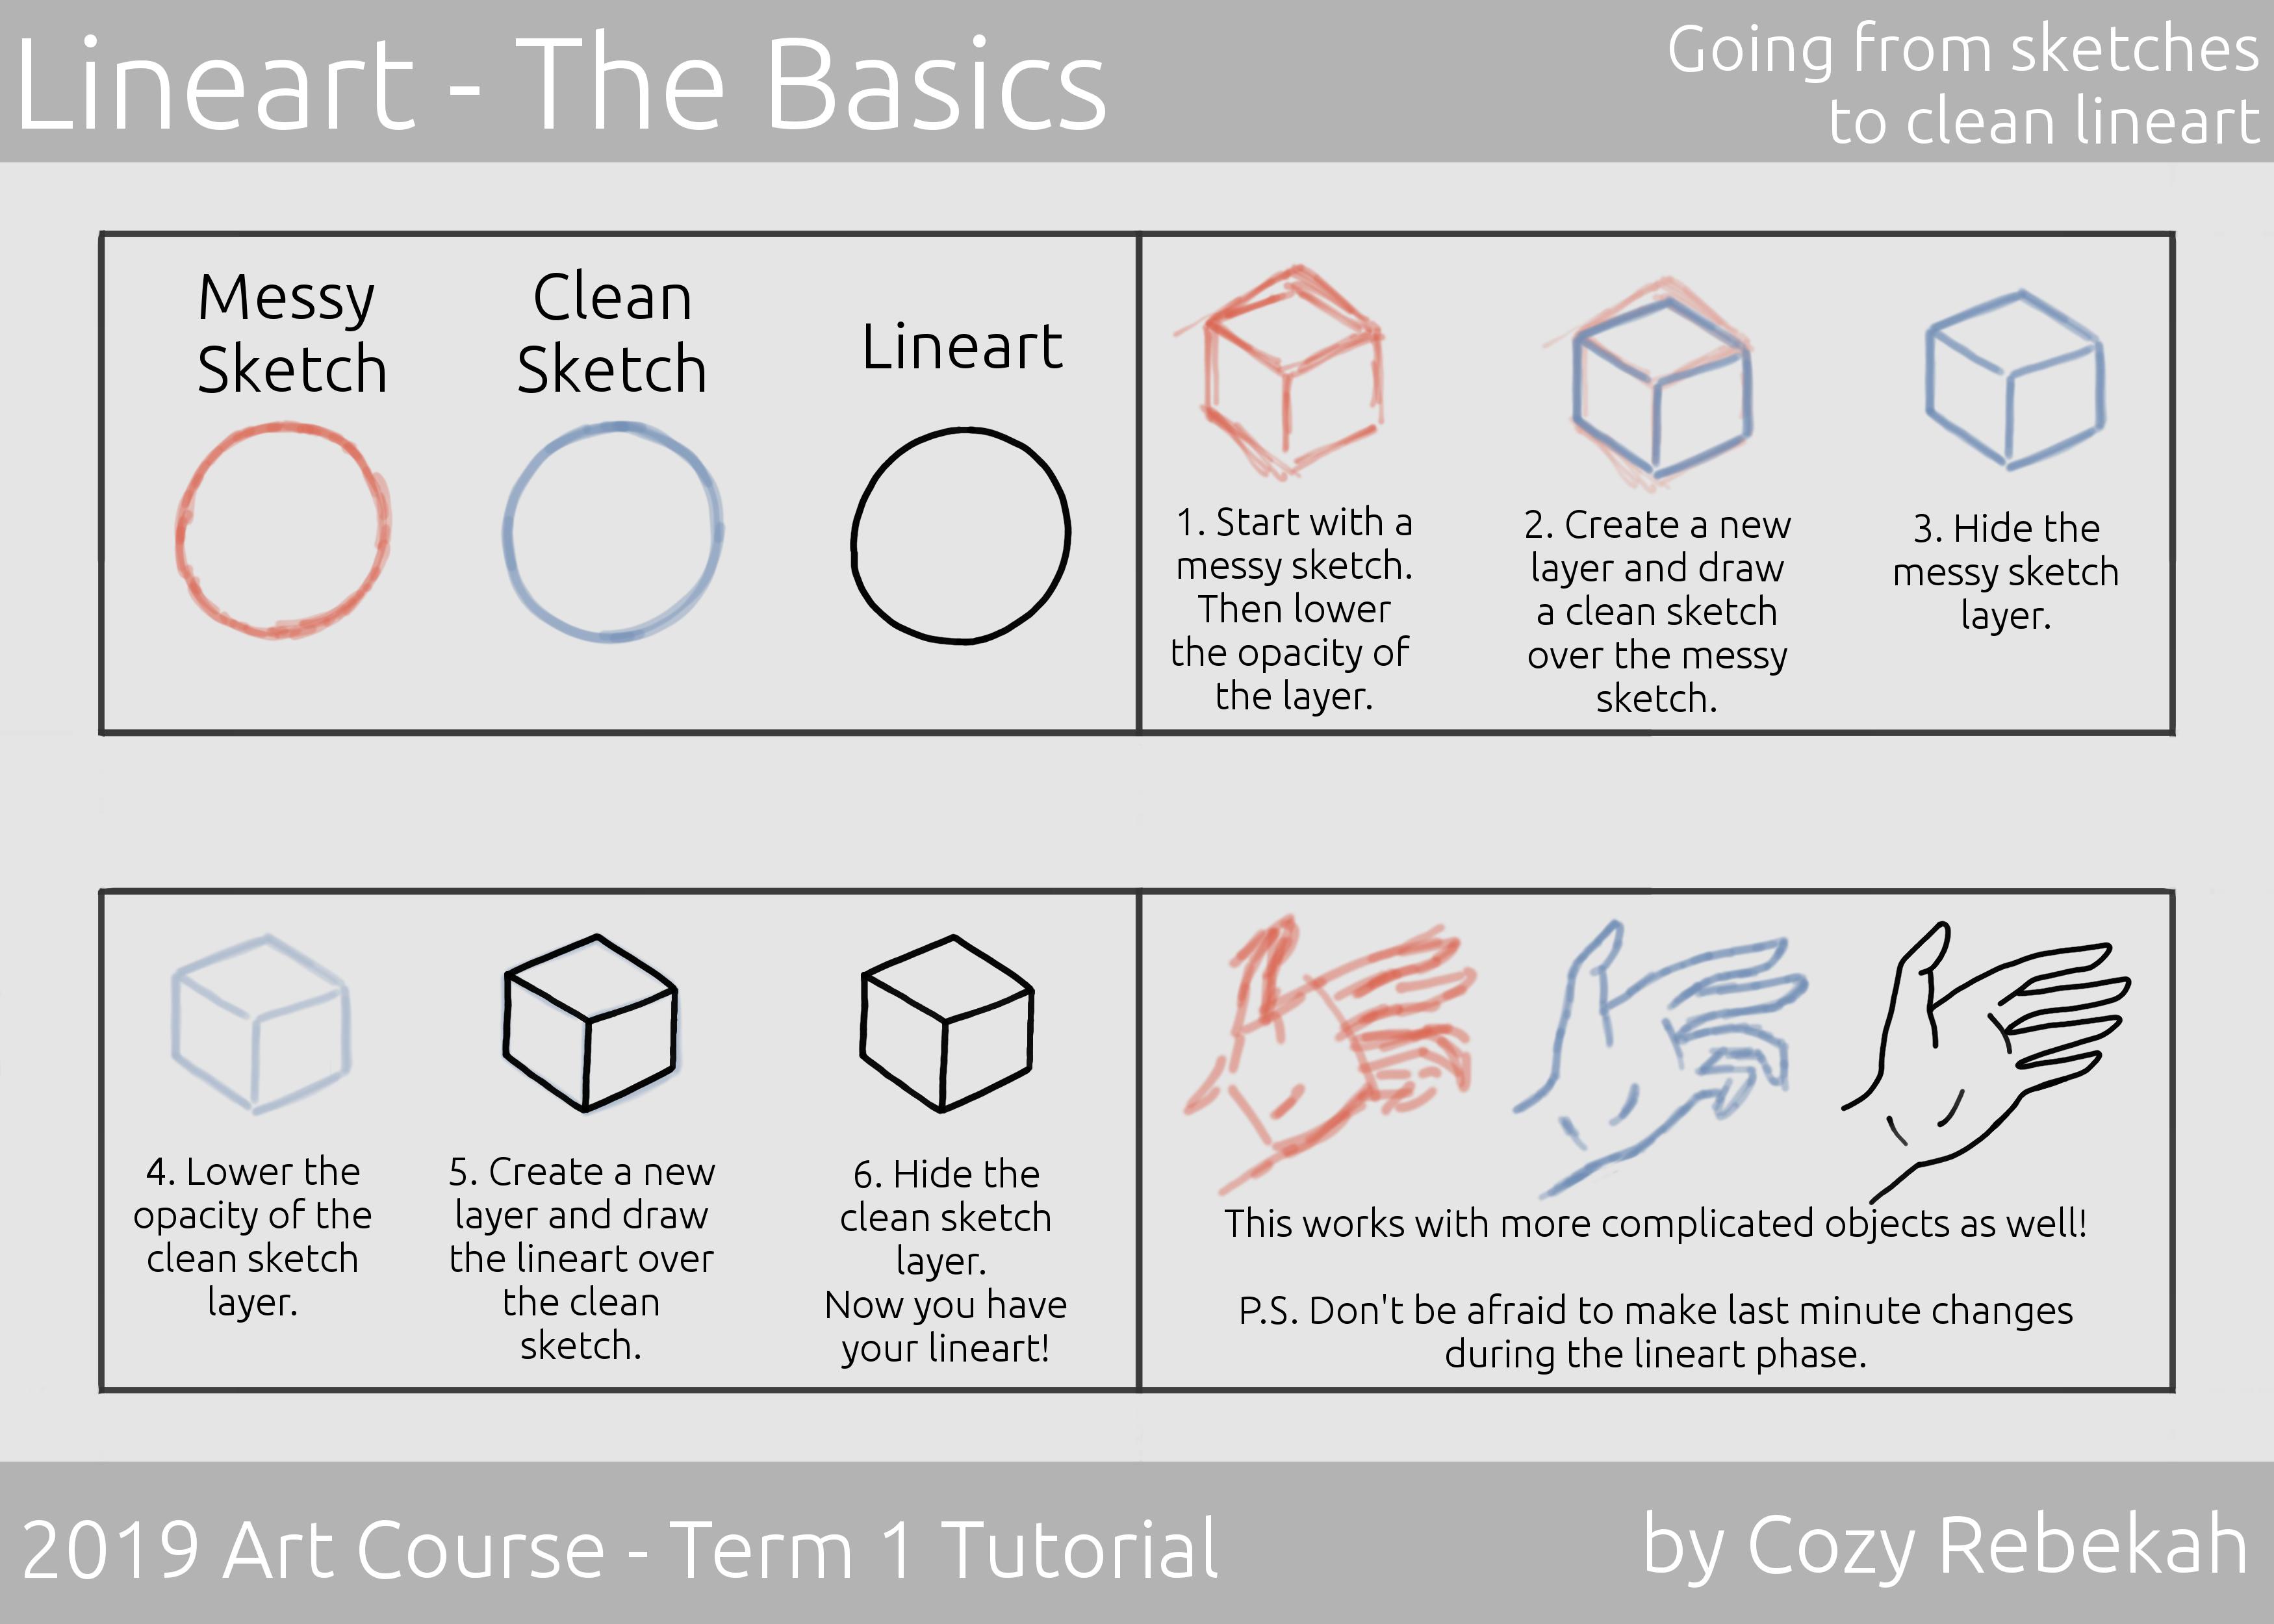 2019 Art Course - Term 1 - Lineart Tutorial P1 - cozyrebekah.com